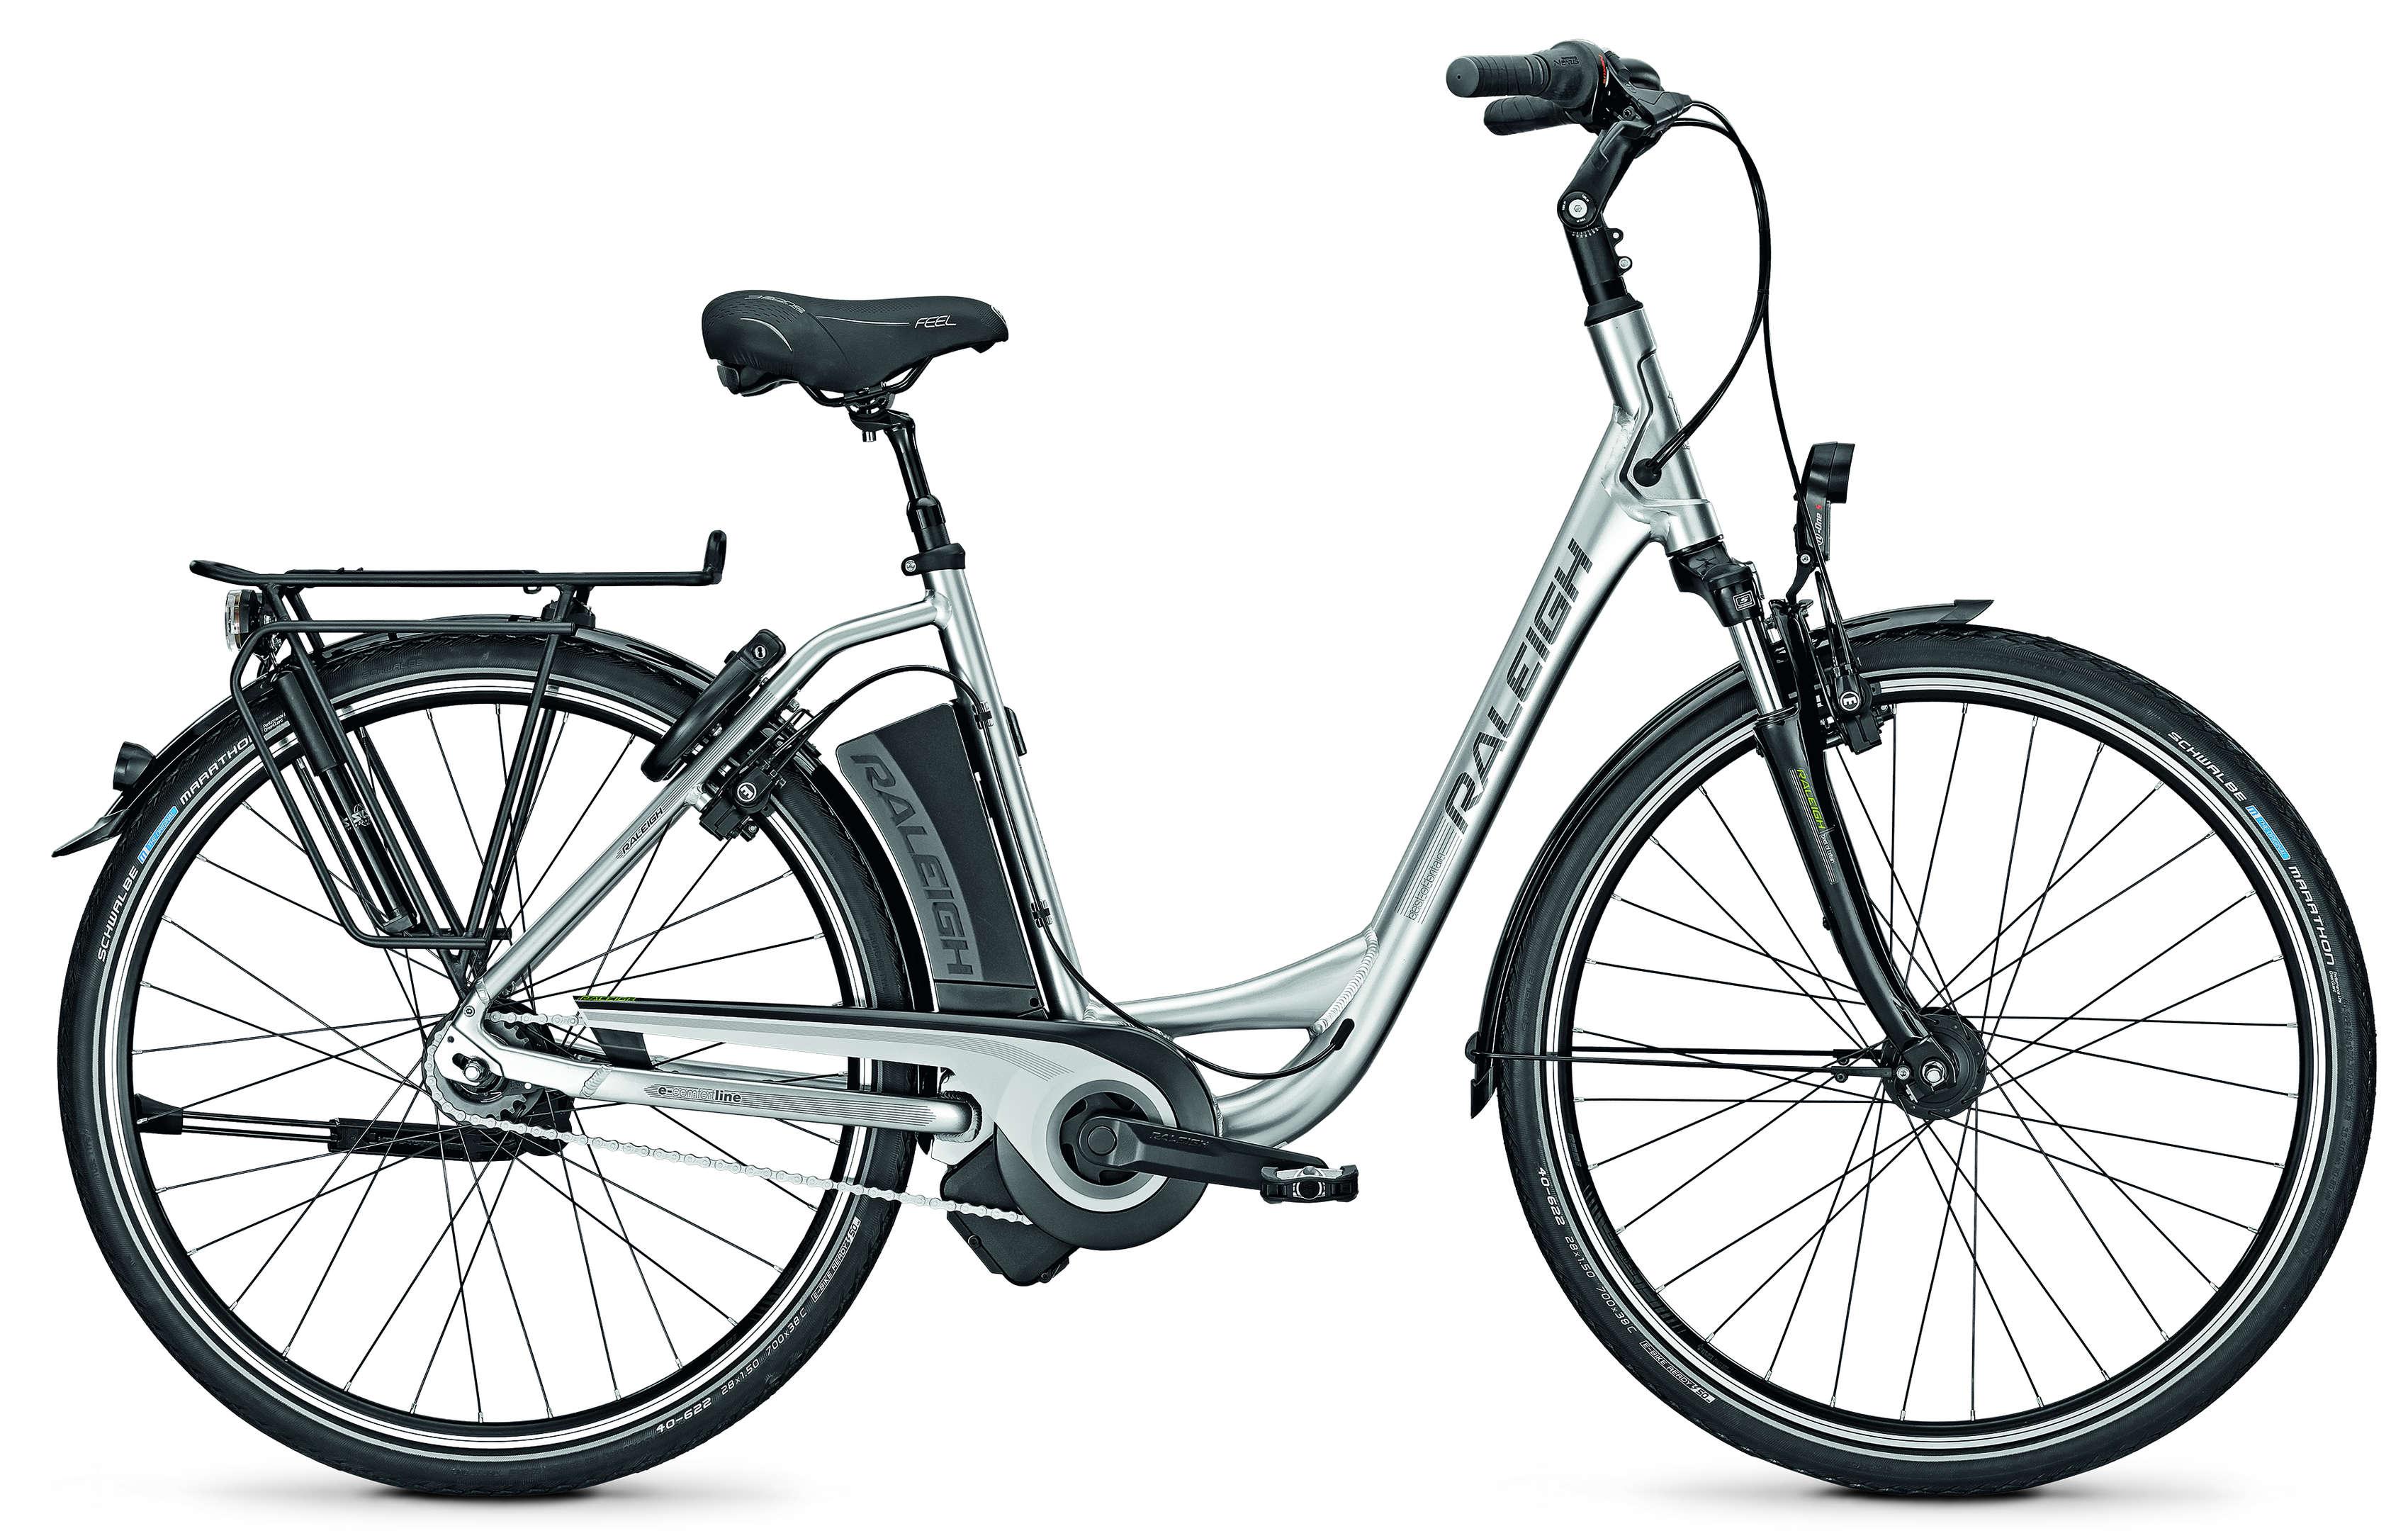 raleigh e bike dover impulse 8 hs hercules bike leasing. Black Bedroom Furniture Sets. Home Design Ideas